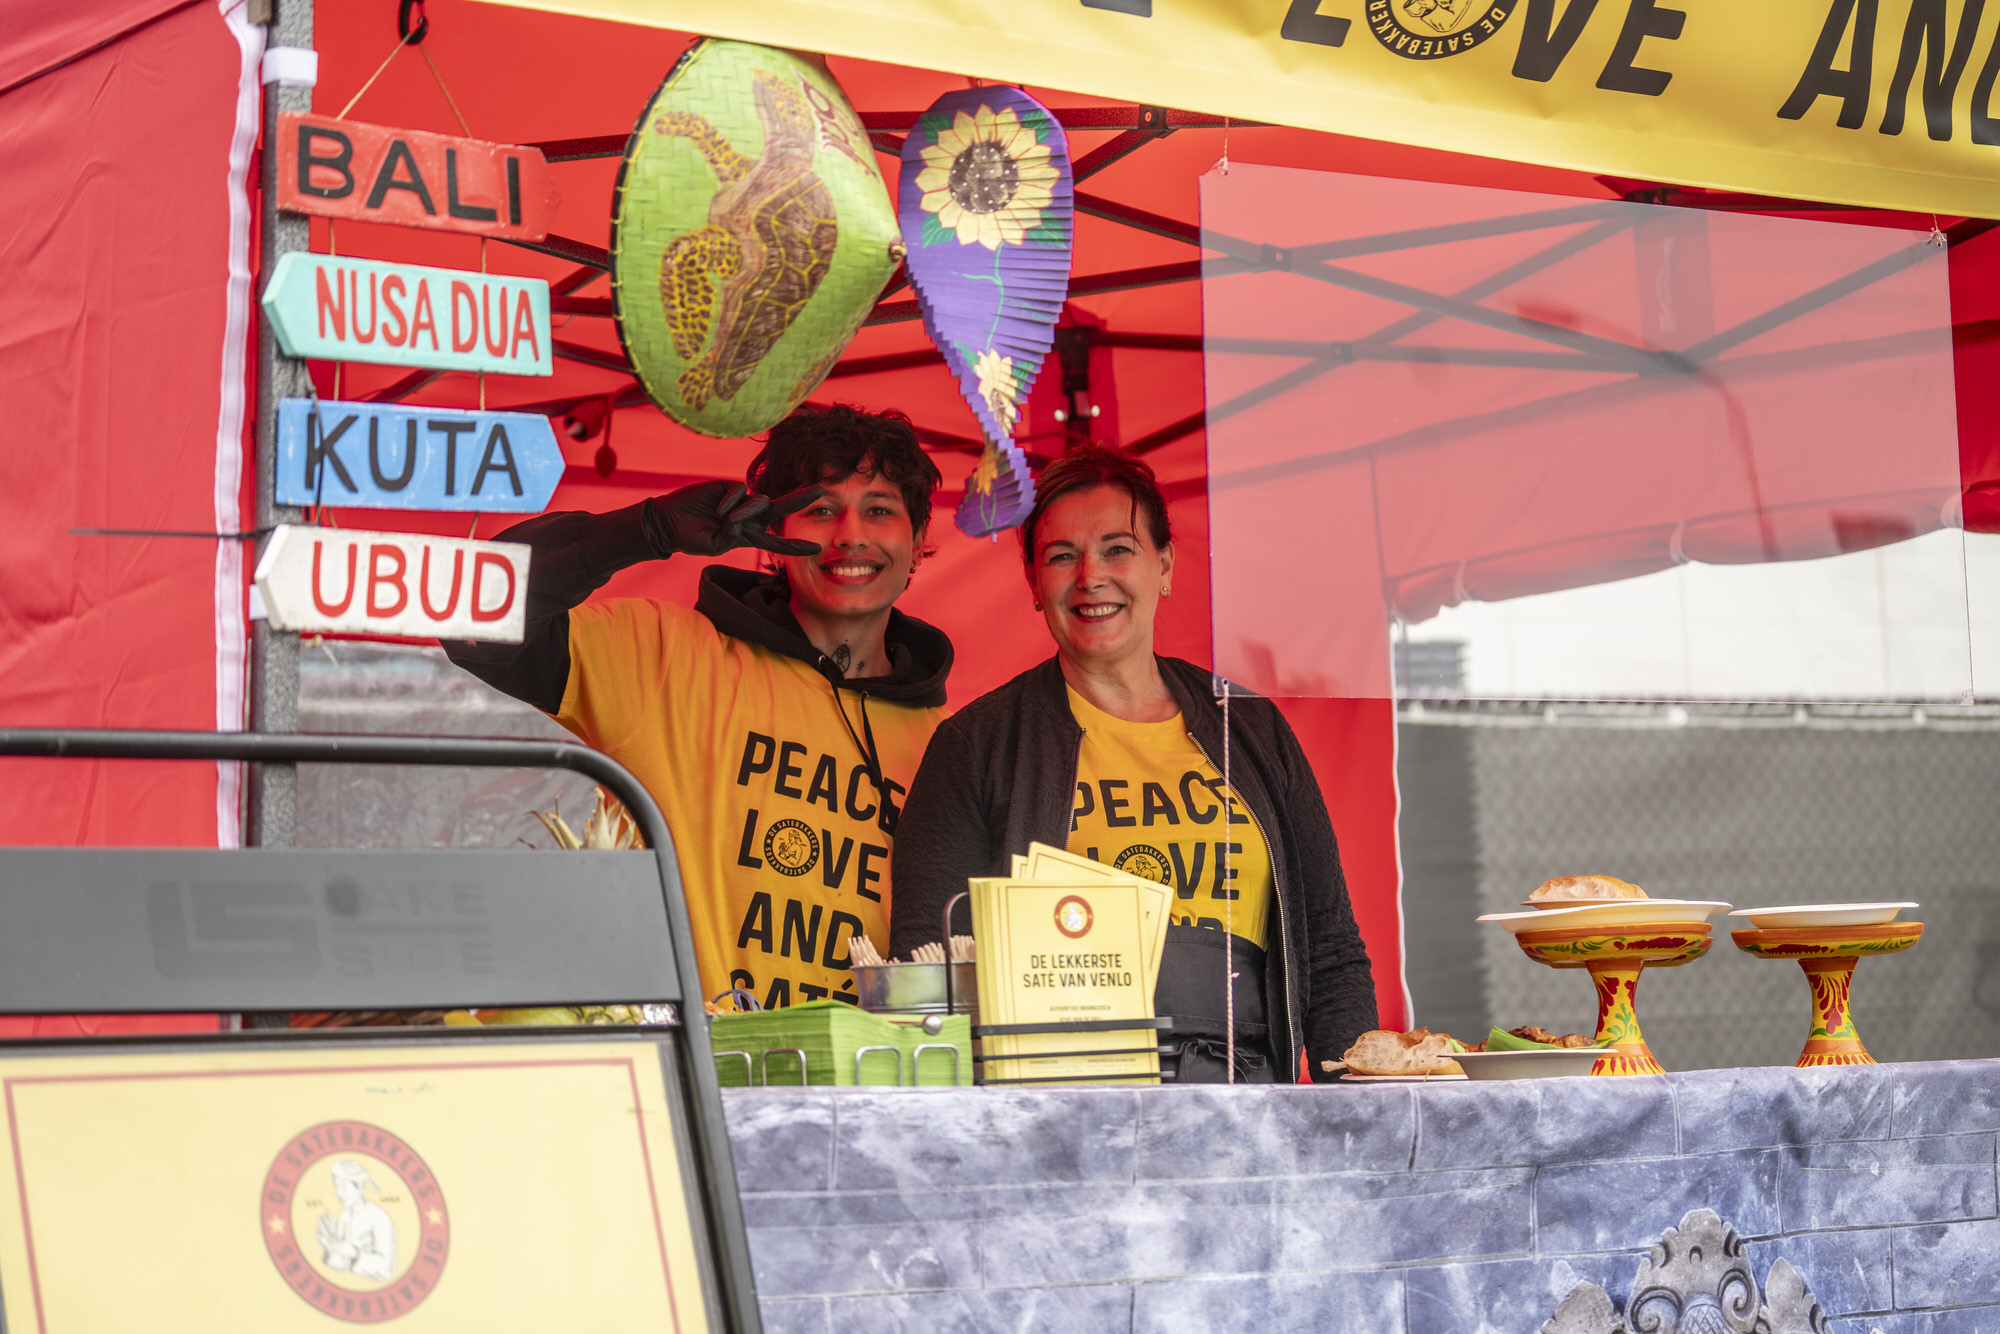 SPIJS-foodfestival-5juni21-00006.jpg